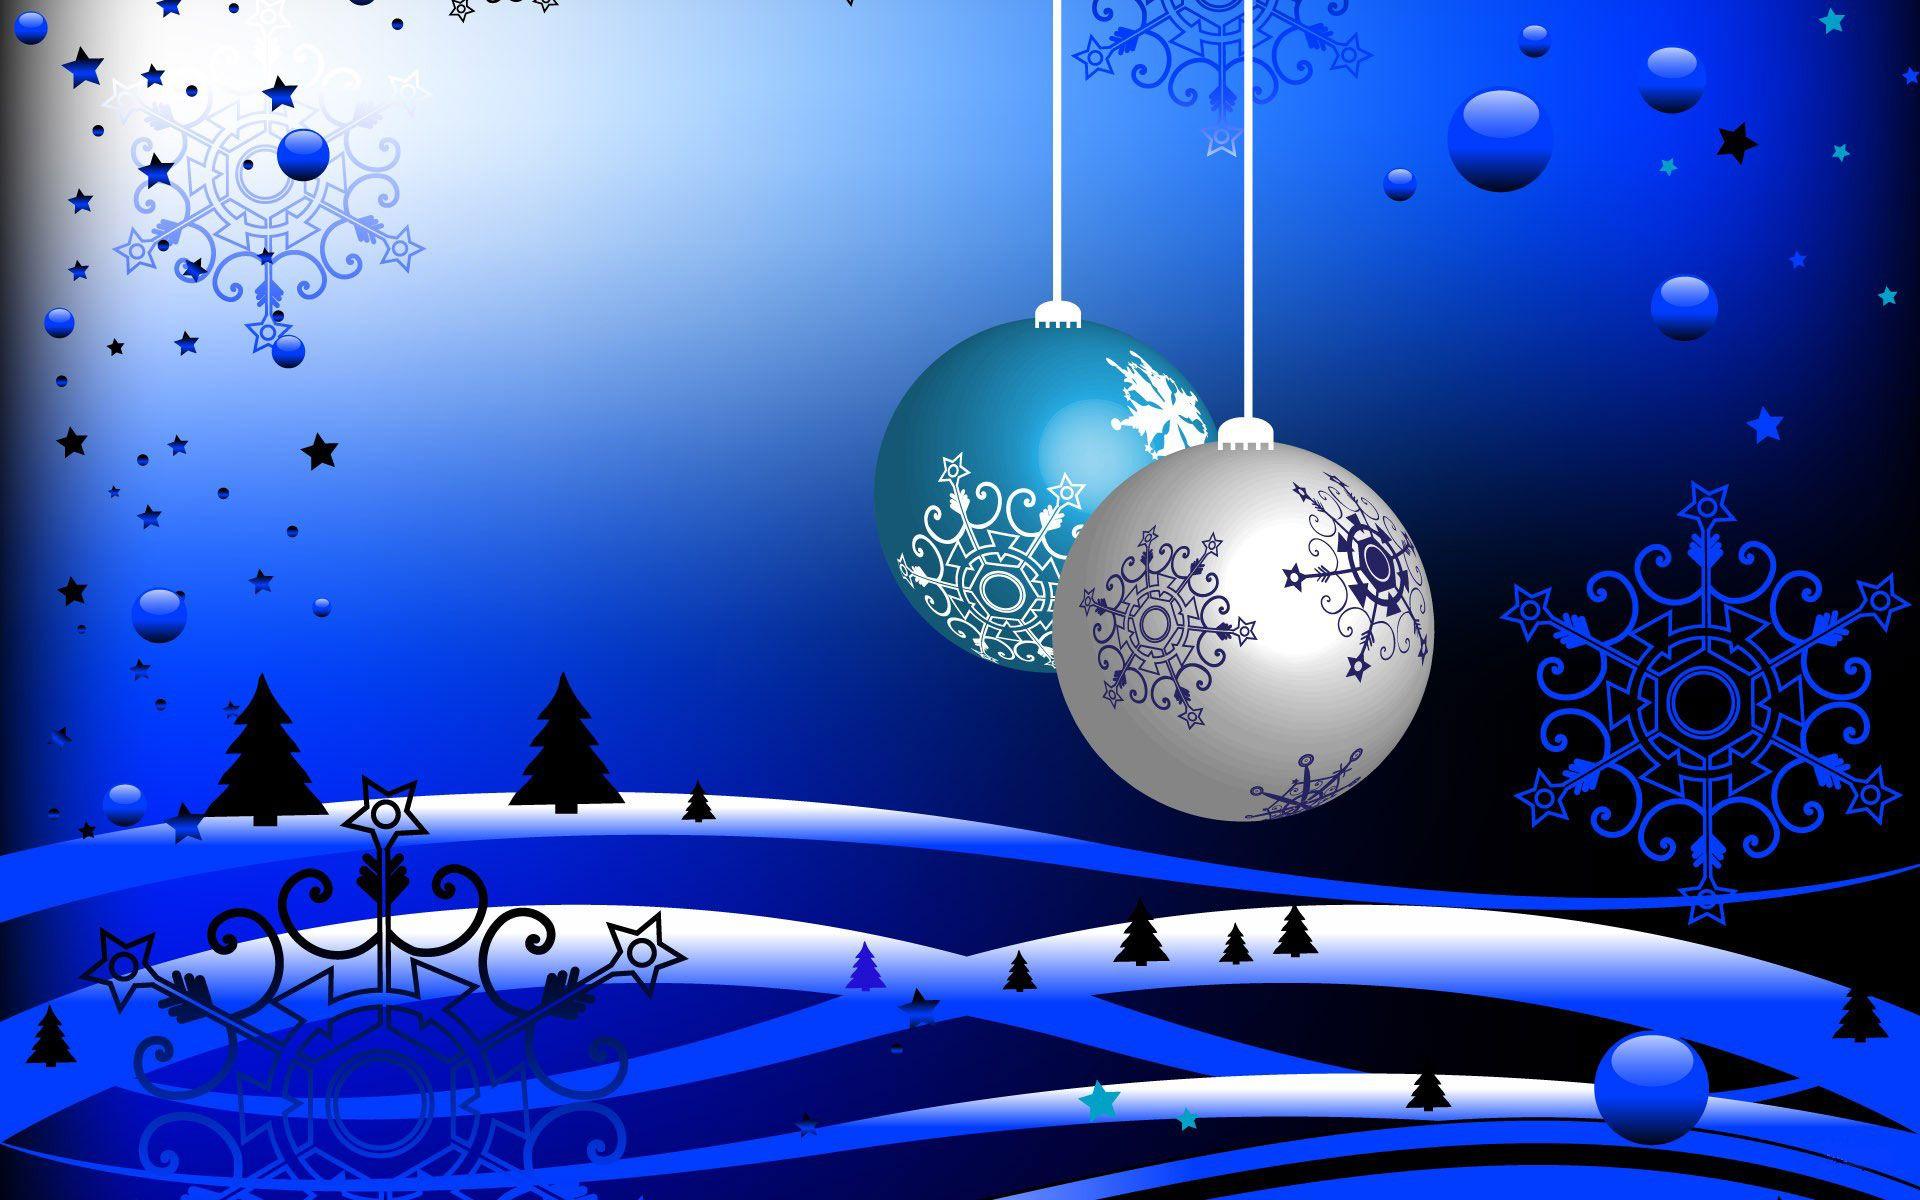 Pin By Megan Palu On Vektor I Foto Klipart Christmas Wallpaper Hd Holiday Wallpaper Christmas Desktop Wallpaper Animated beautiful christmas wallpaper